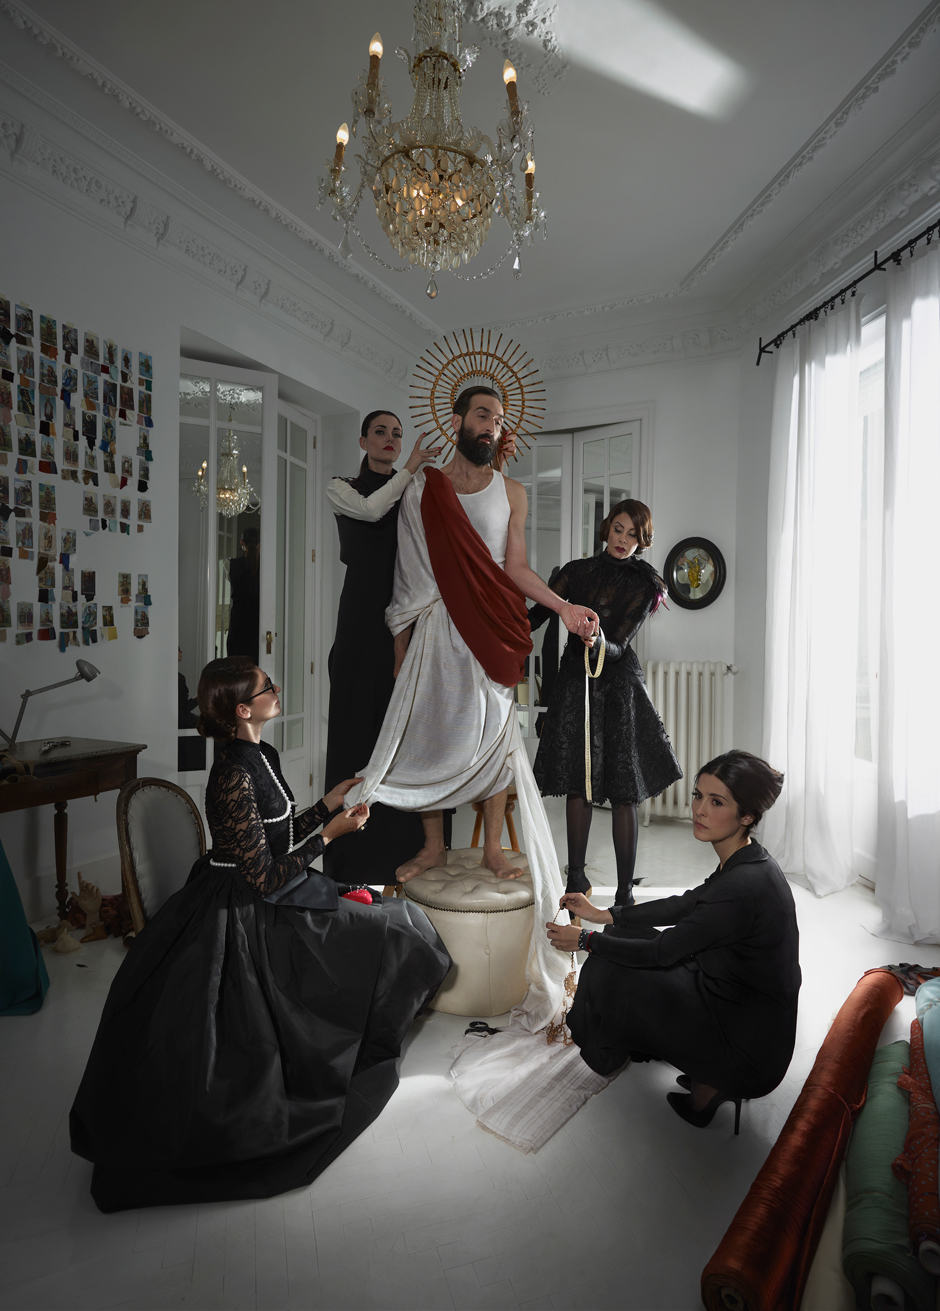 Vestir santos, 2014. Impresión con tintas pigmentadas en papel baritado perla 130 x 170 cms. montada sobre foam con moldura de madera.